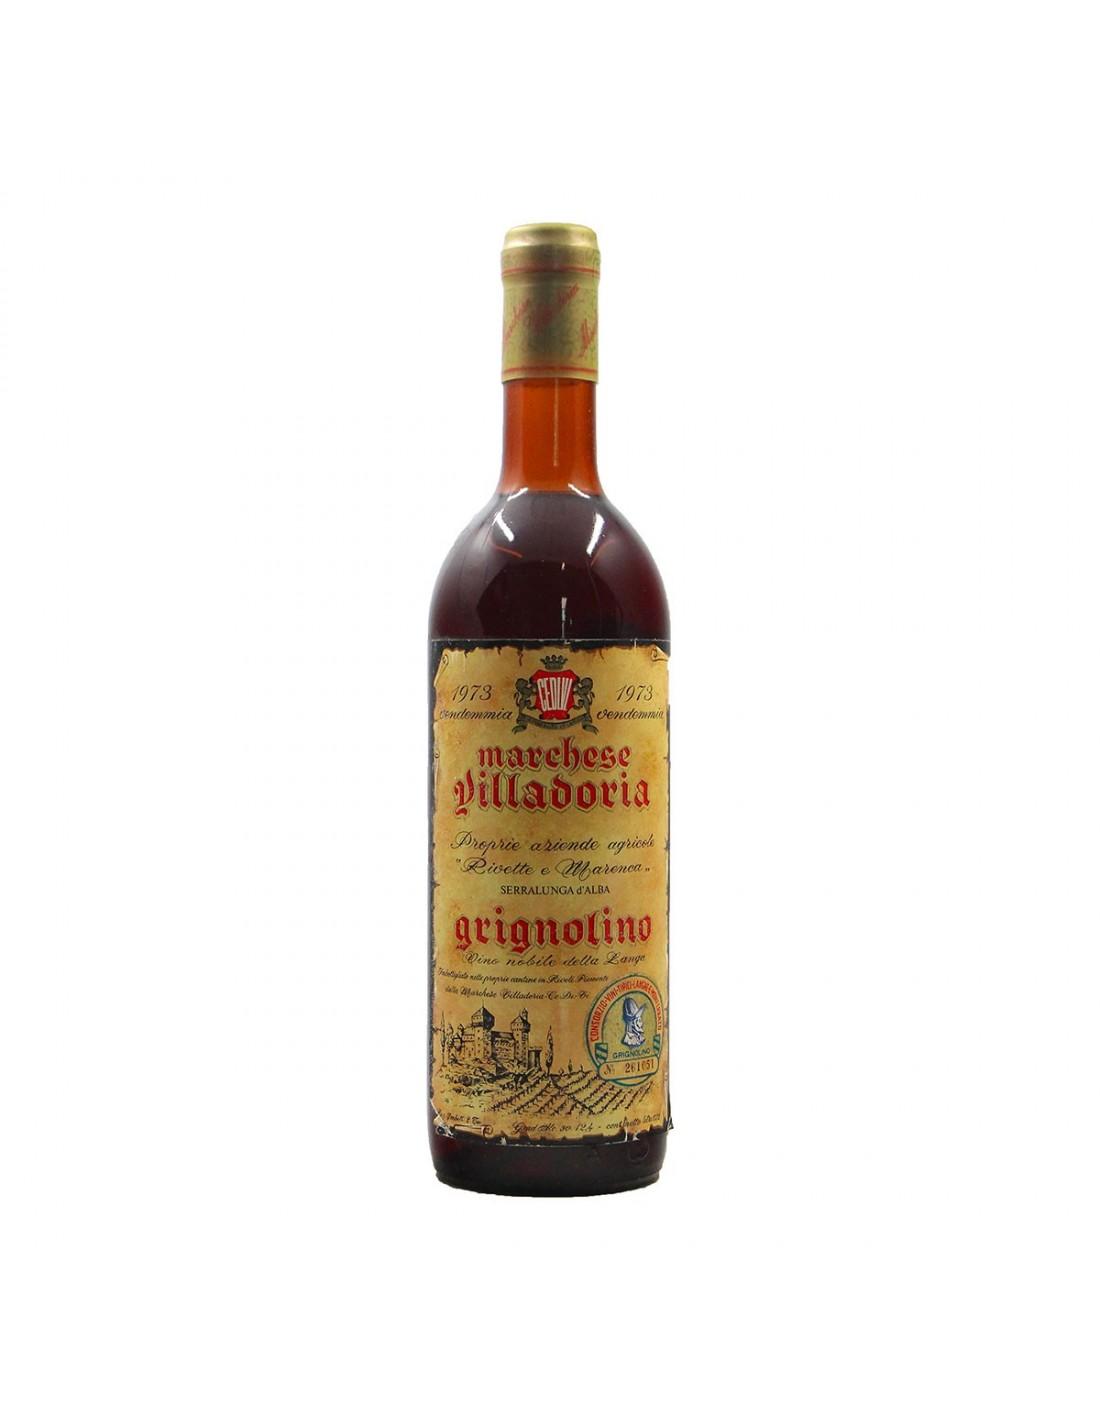 GRIGNOLINO 1973 VILLADORIA Grandi Bottiglie